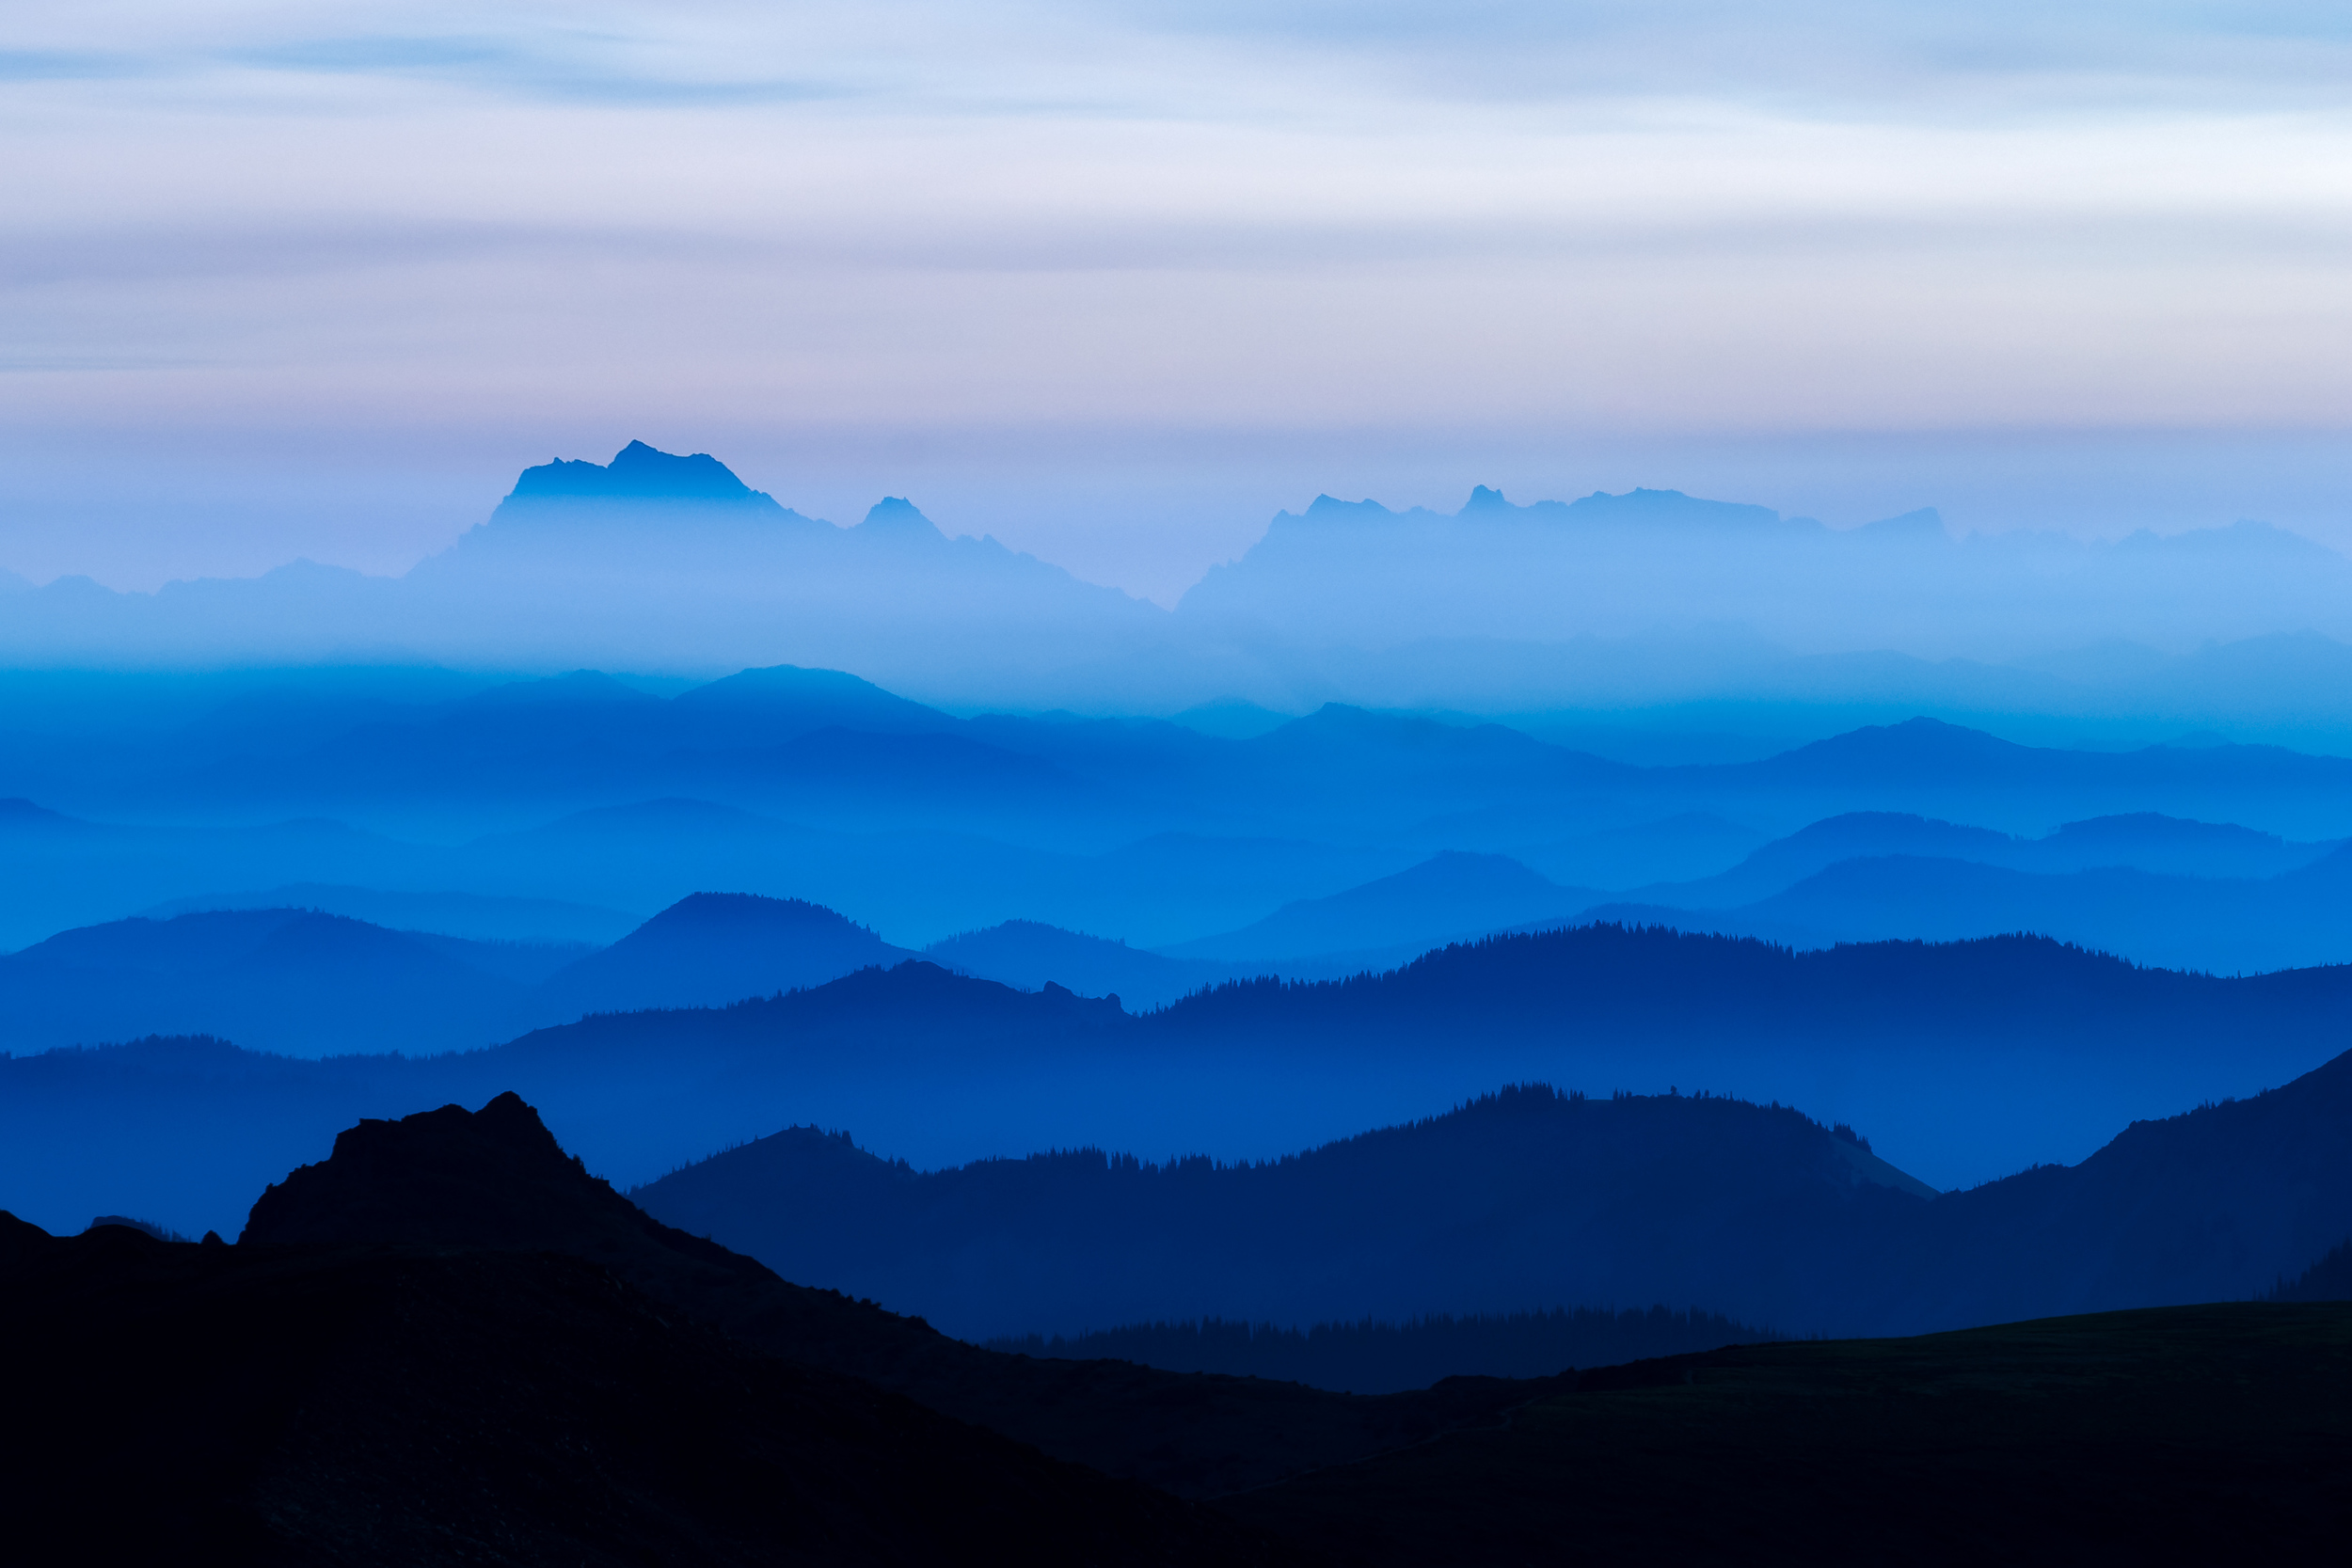 Morning Haze - Mt Stuart and the Cascades